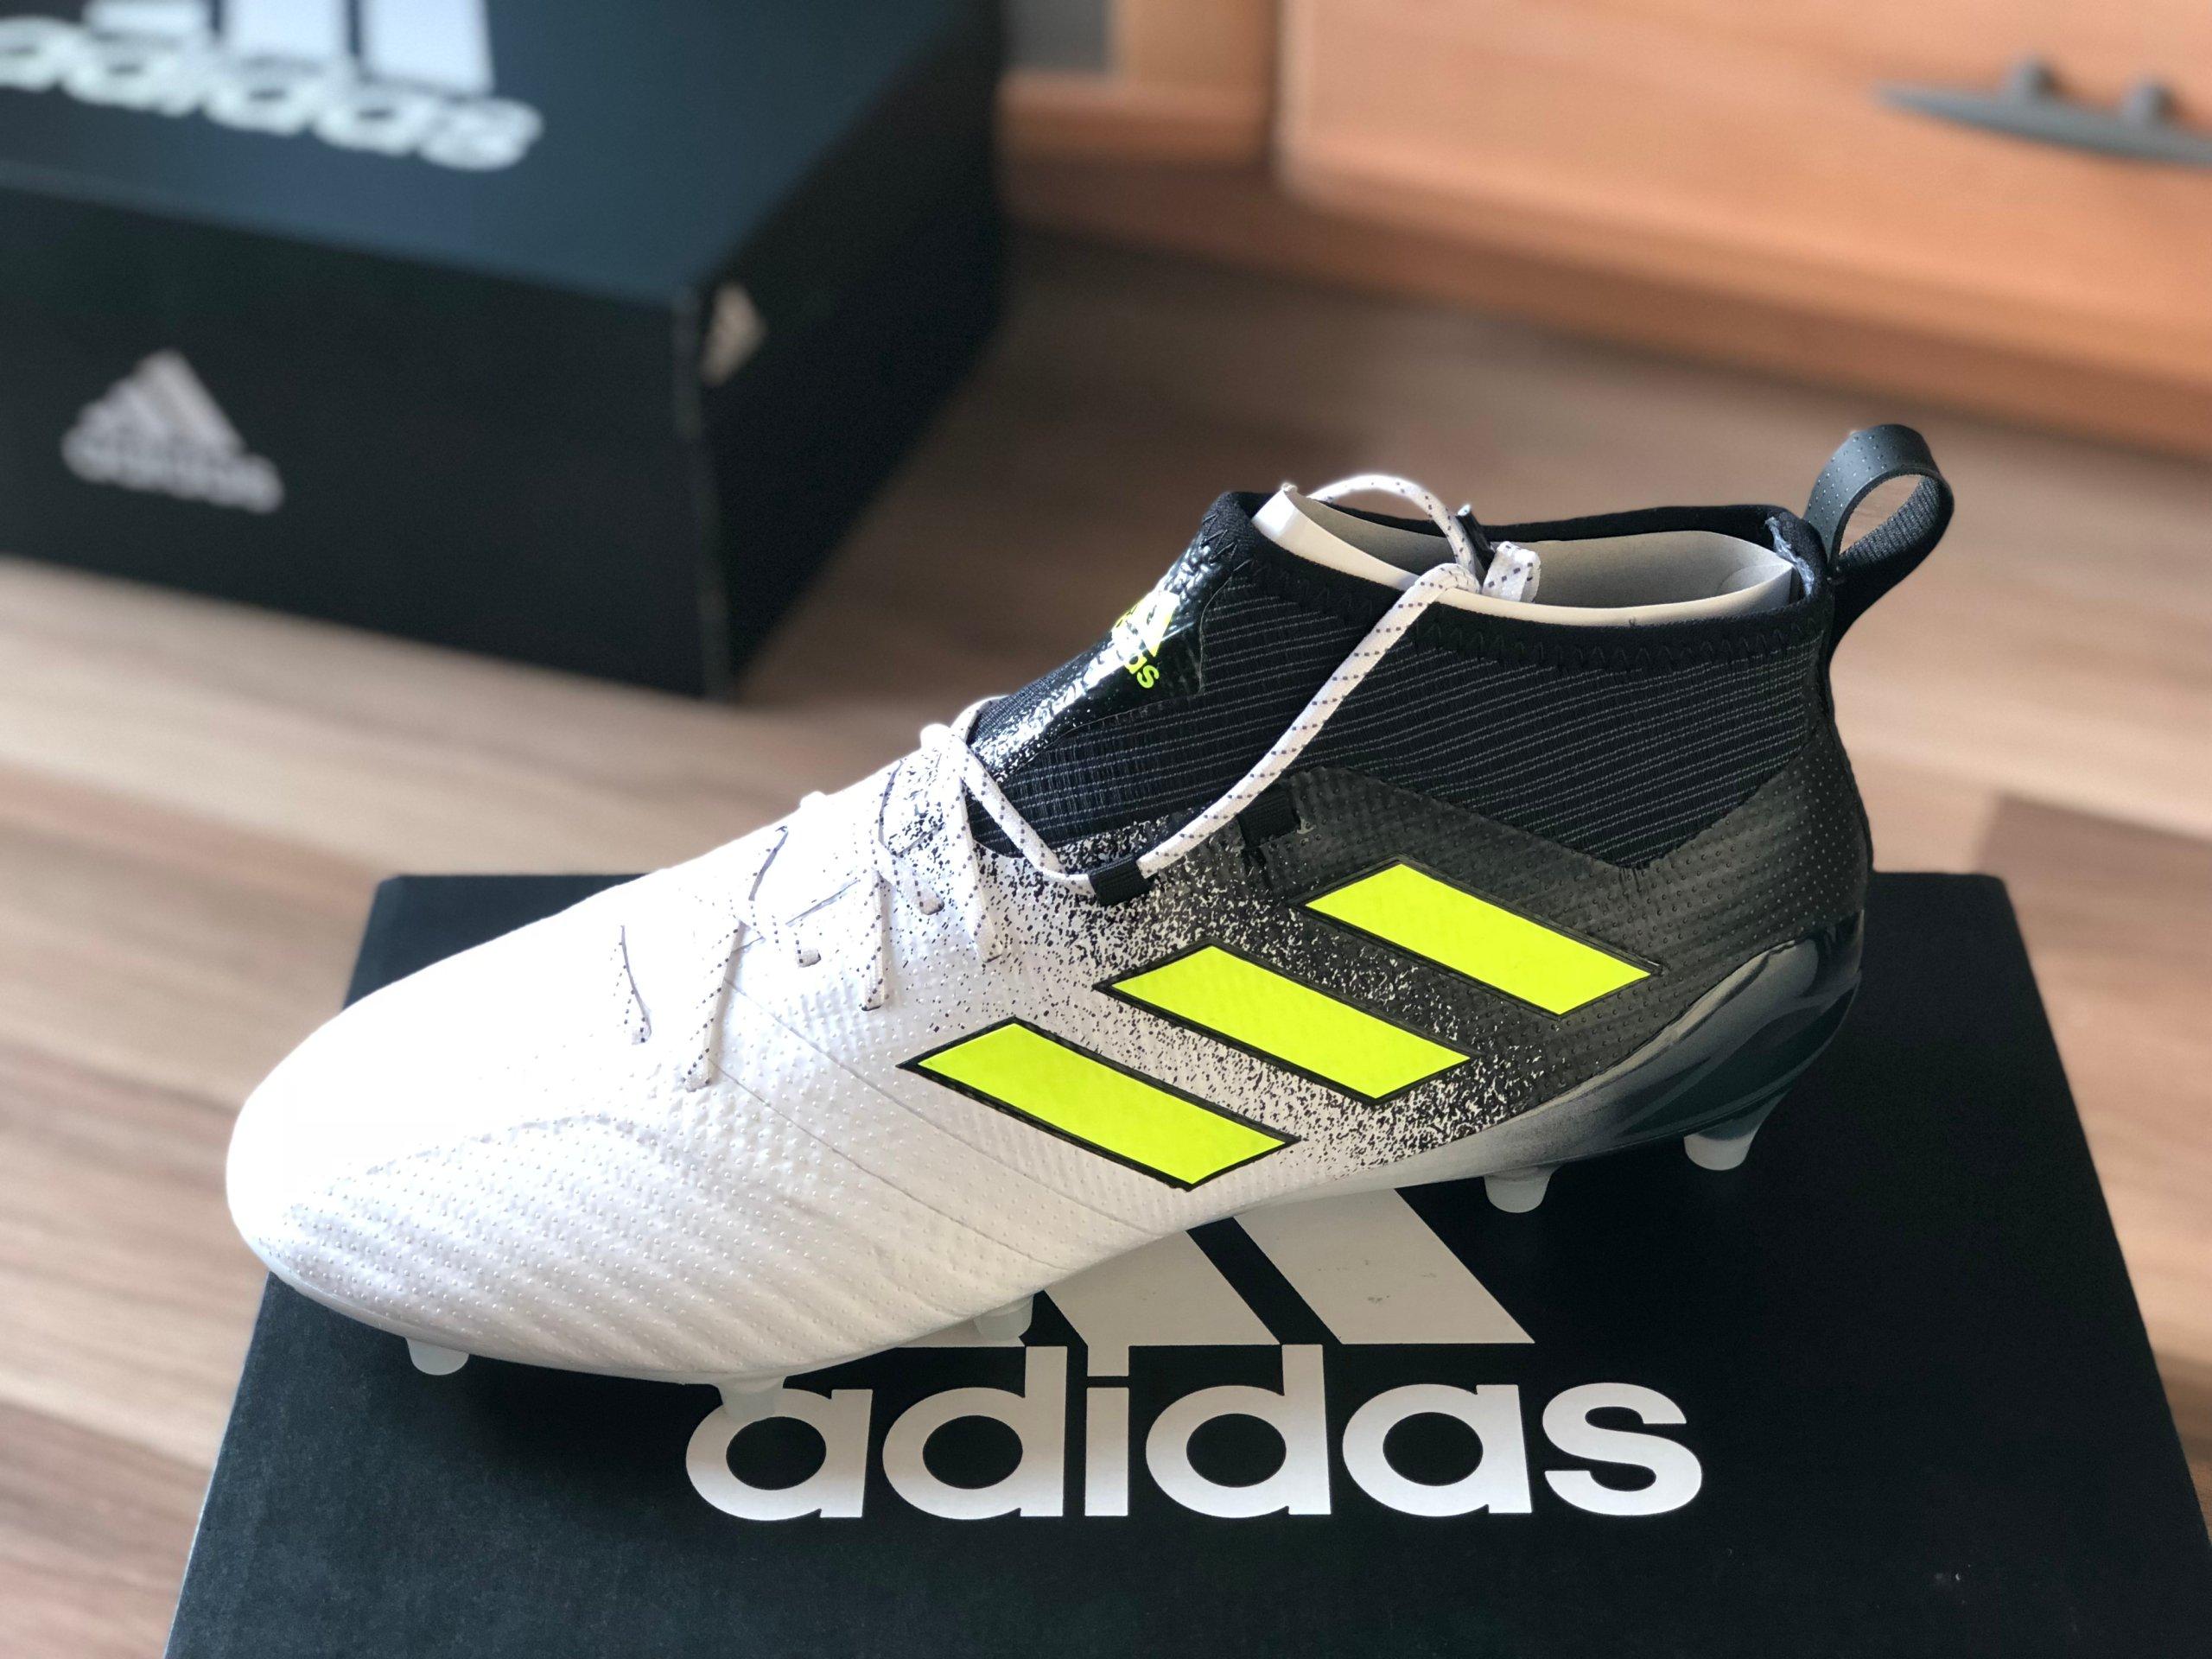 newest 0cc55 461ba Adidas ACE 17.1 Primeknit FG S77035 rozmiar 44 23